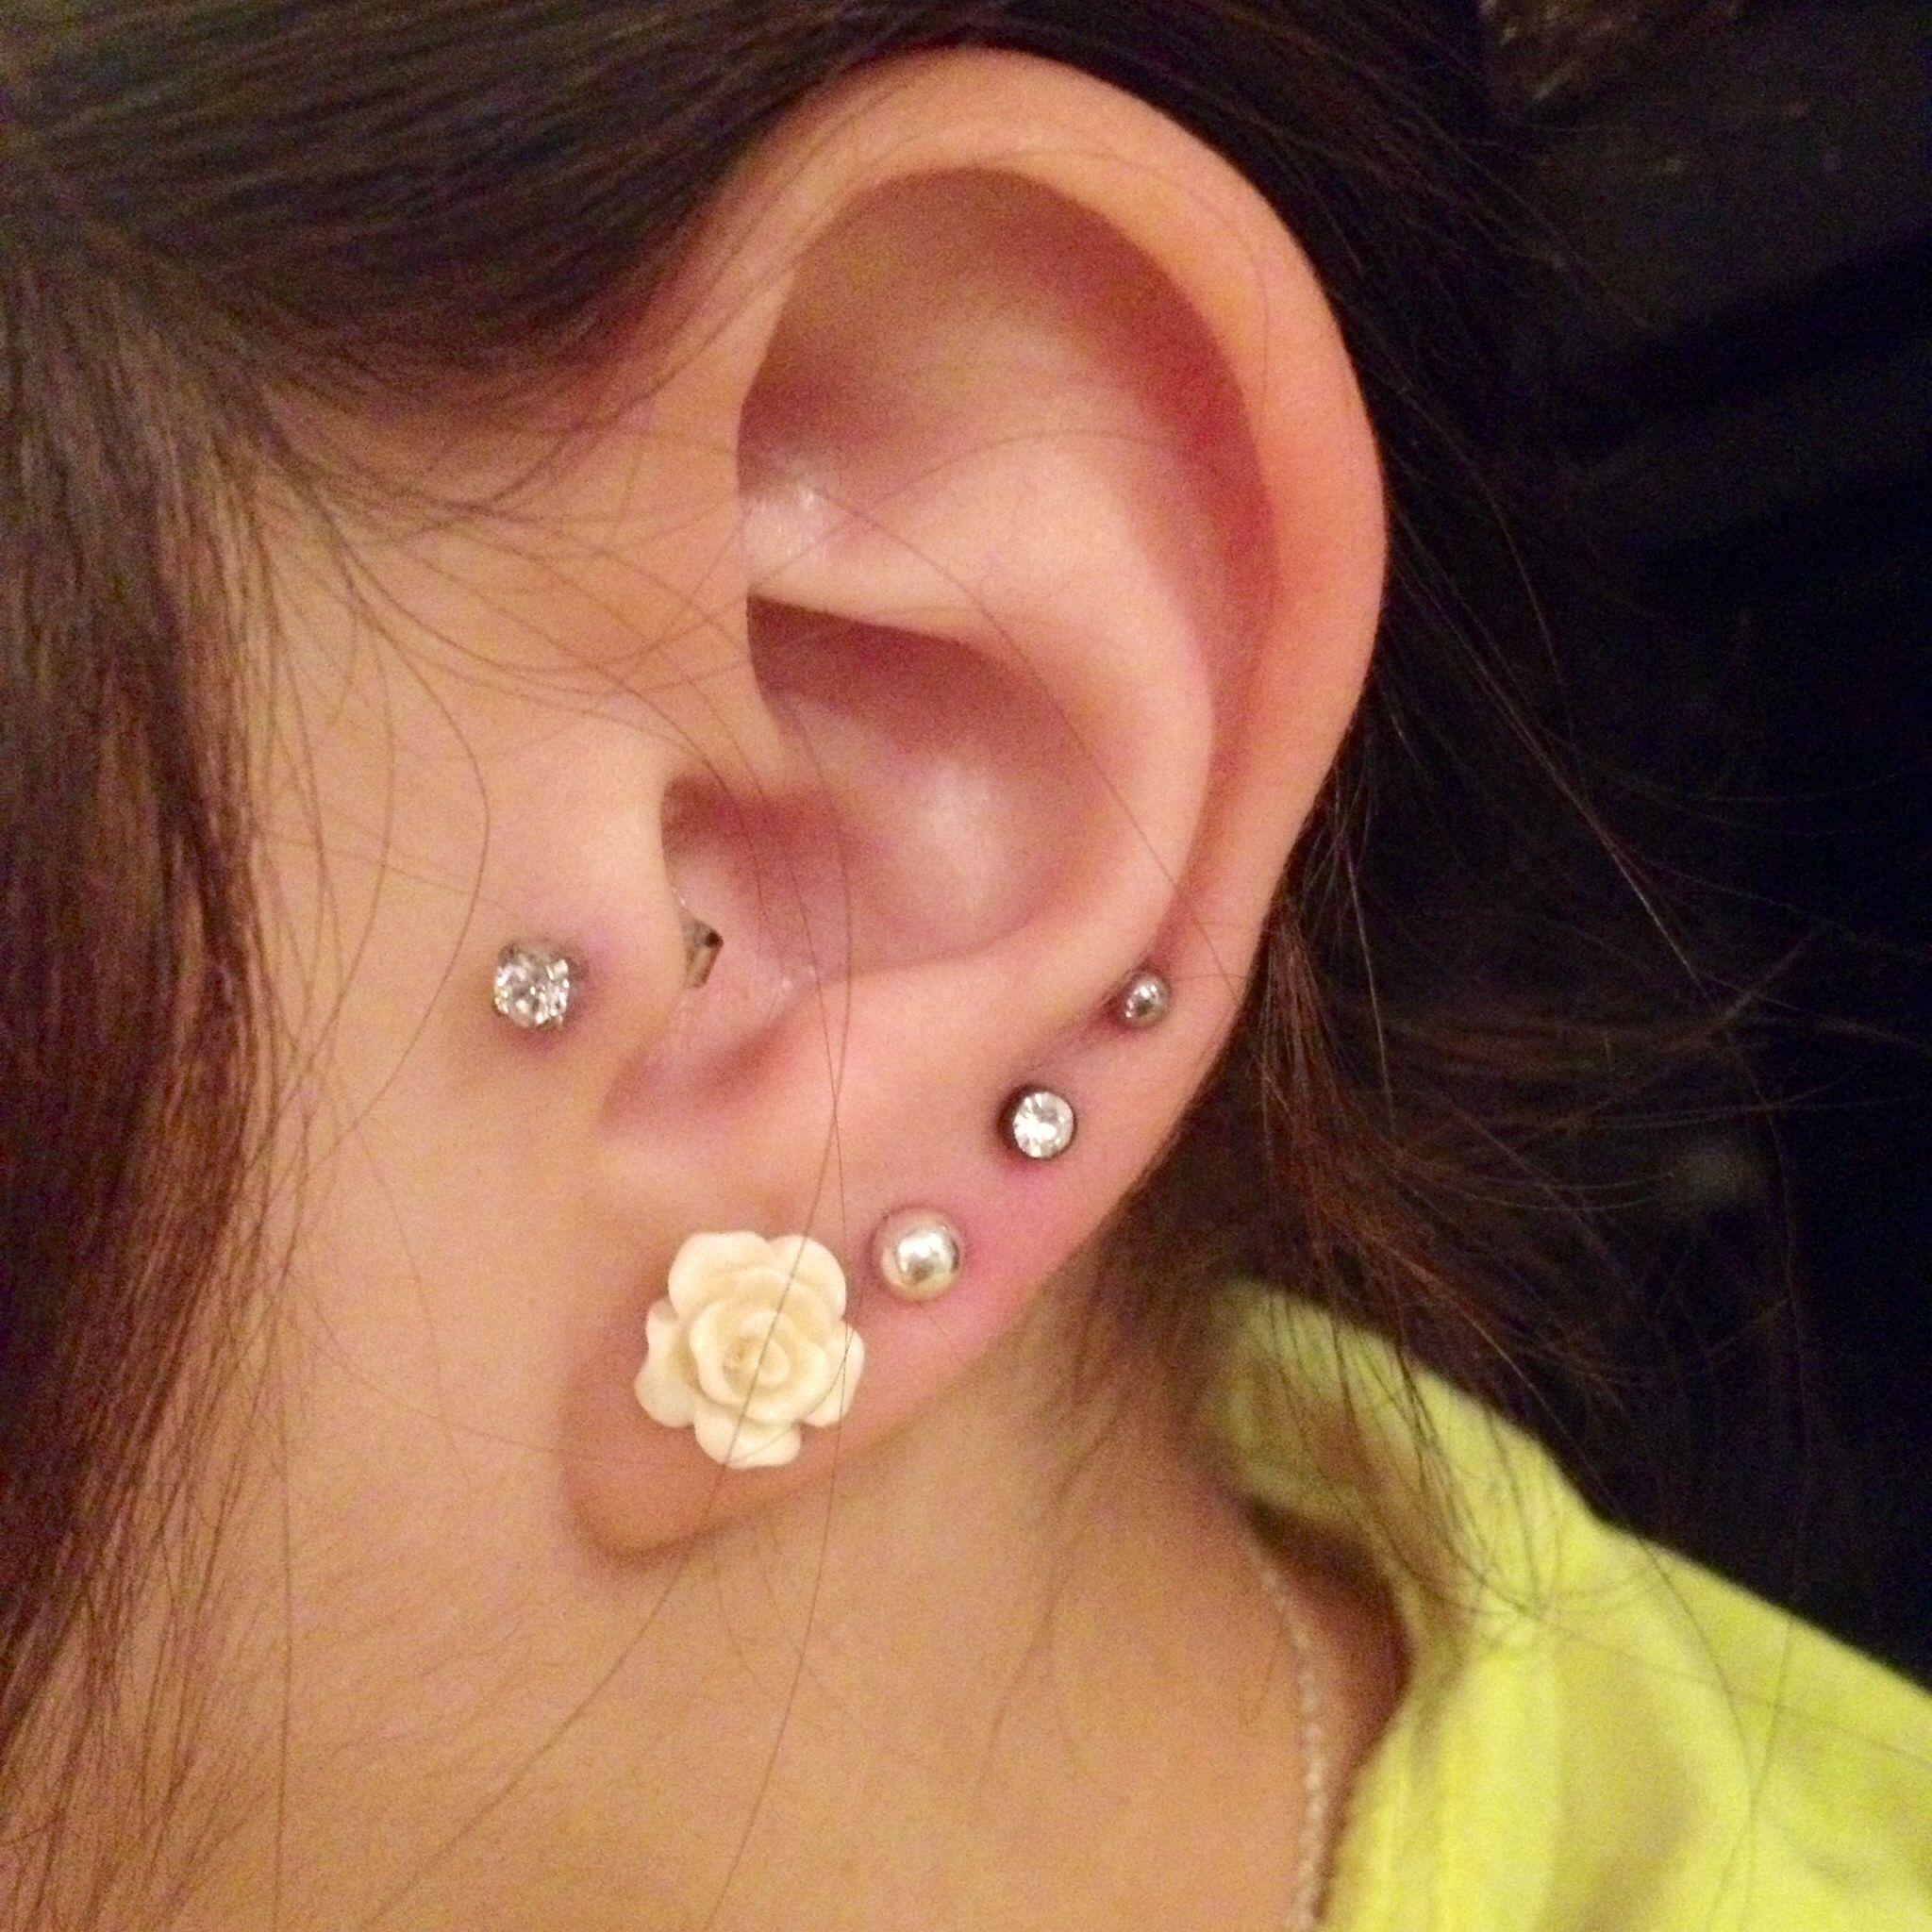 Tragus piercing names  Got my triages pierced   uc Piercings ue  Pinterest  Piercing